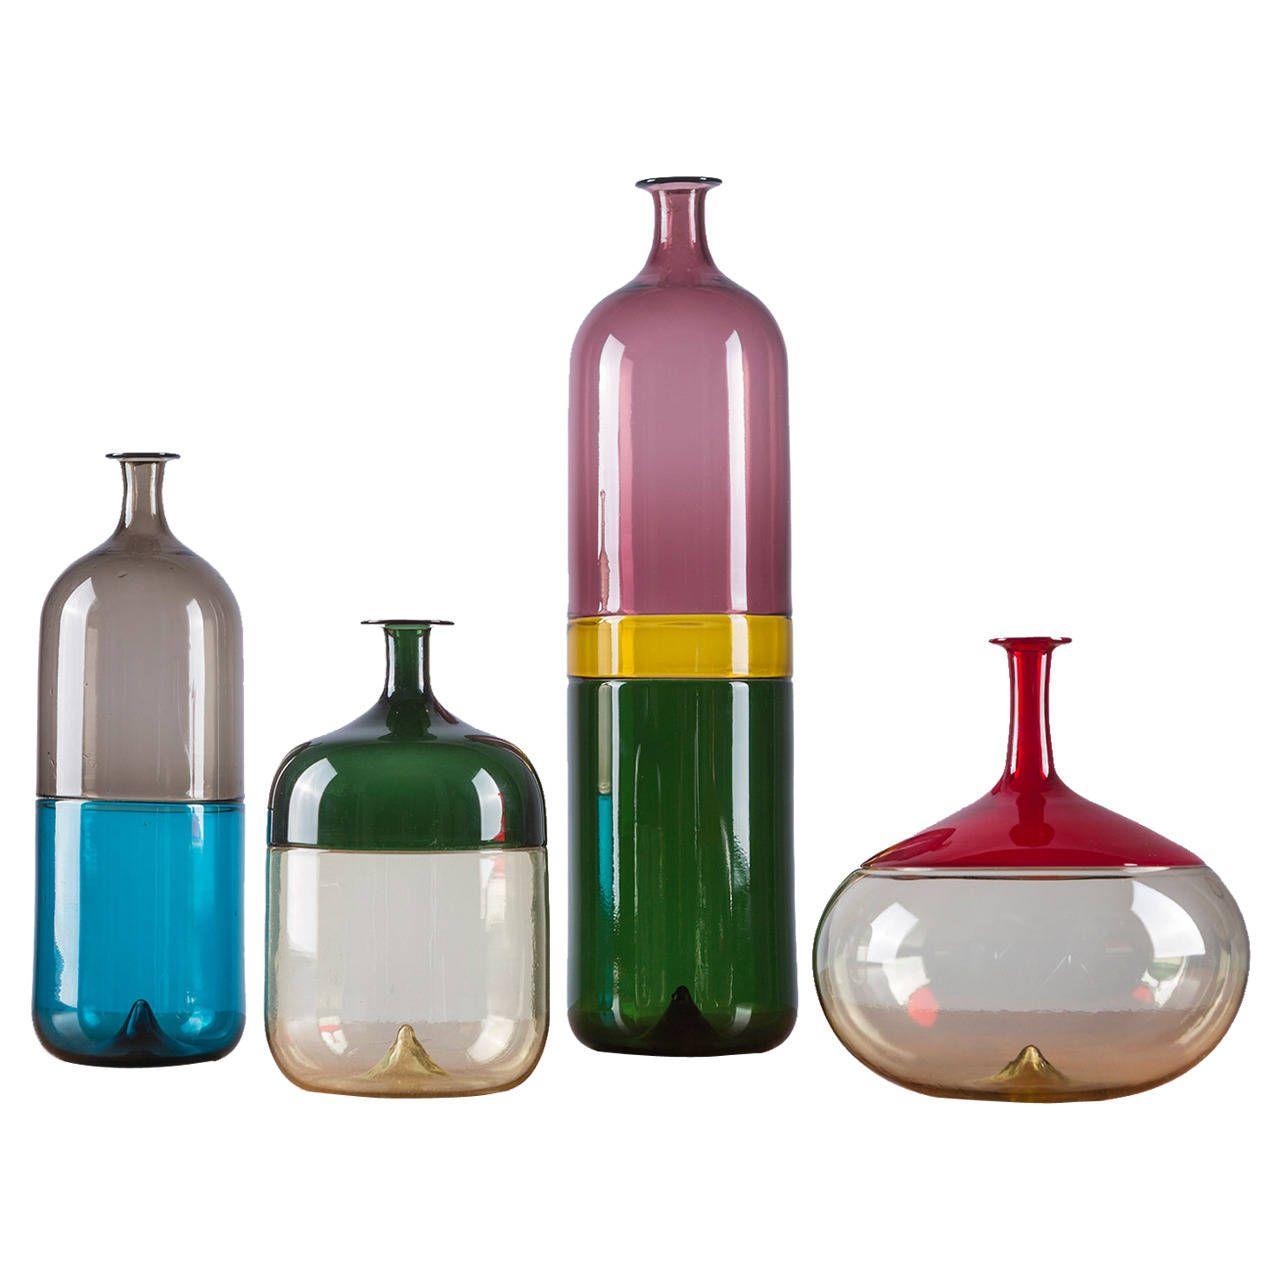 Modern Glass Vases Rare Set Of Four Bolle Vases By Tapio Wirkkala For Venini